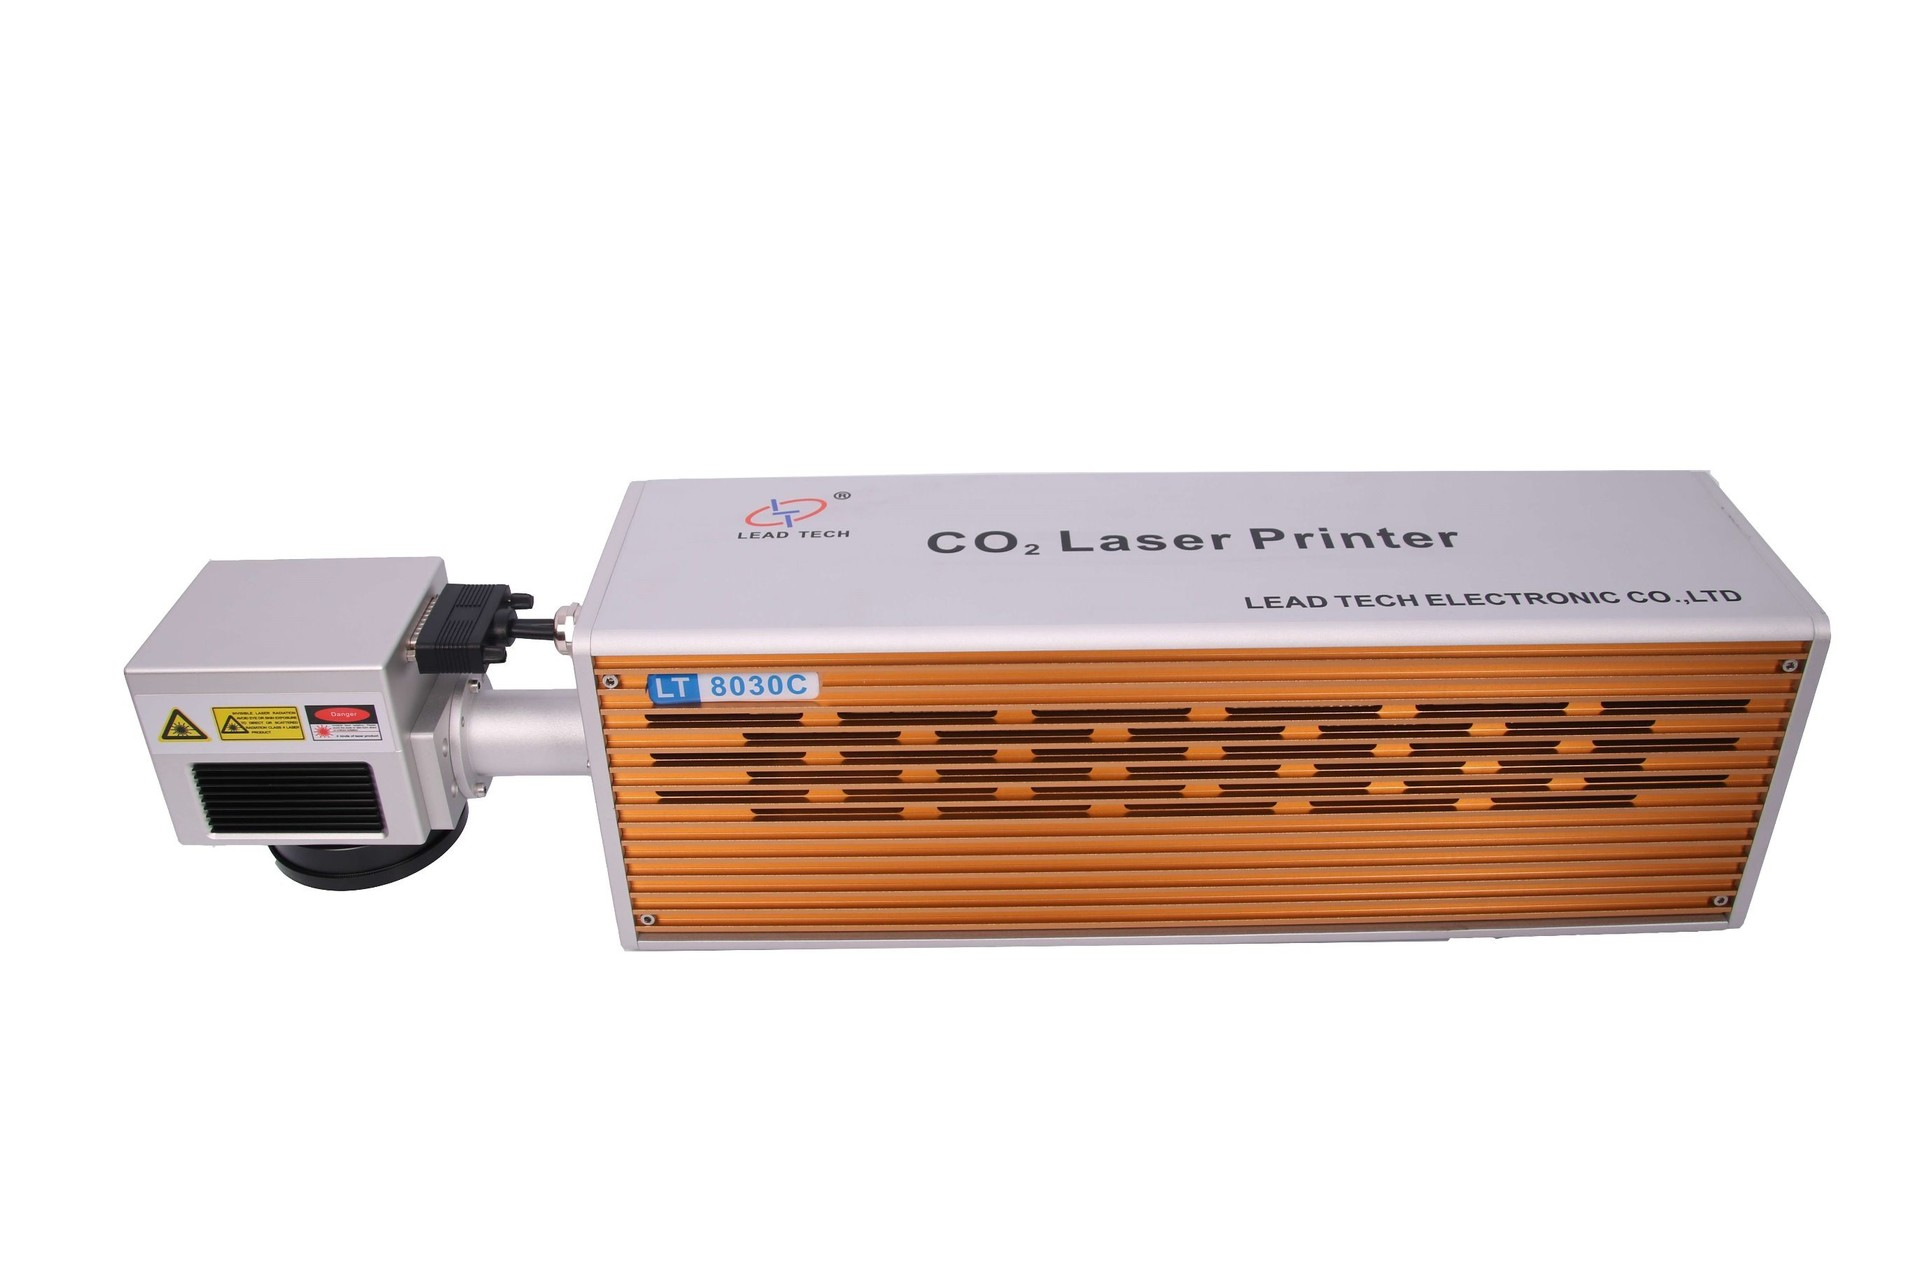 Lt8020c/Lt8030c CO2 High Performance Economic for HDPE PVC Plastic Pipe Cable Aluminum